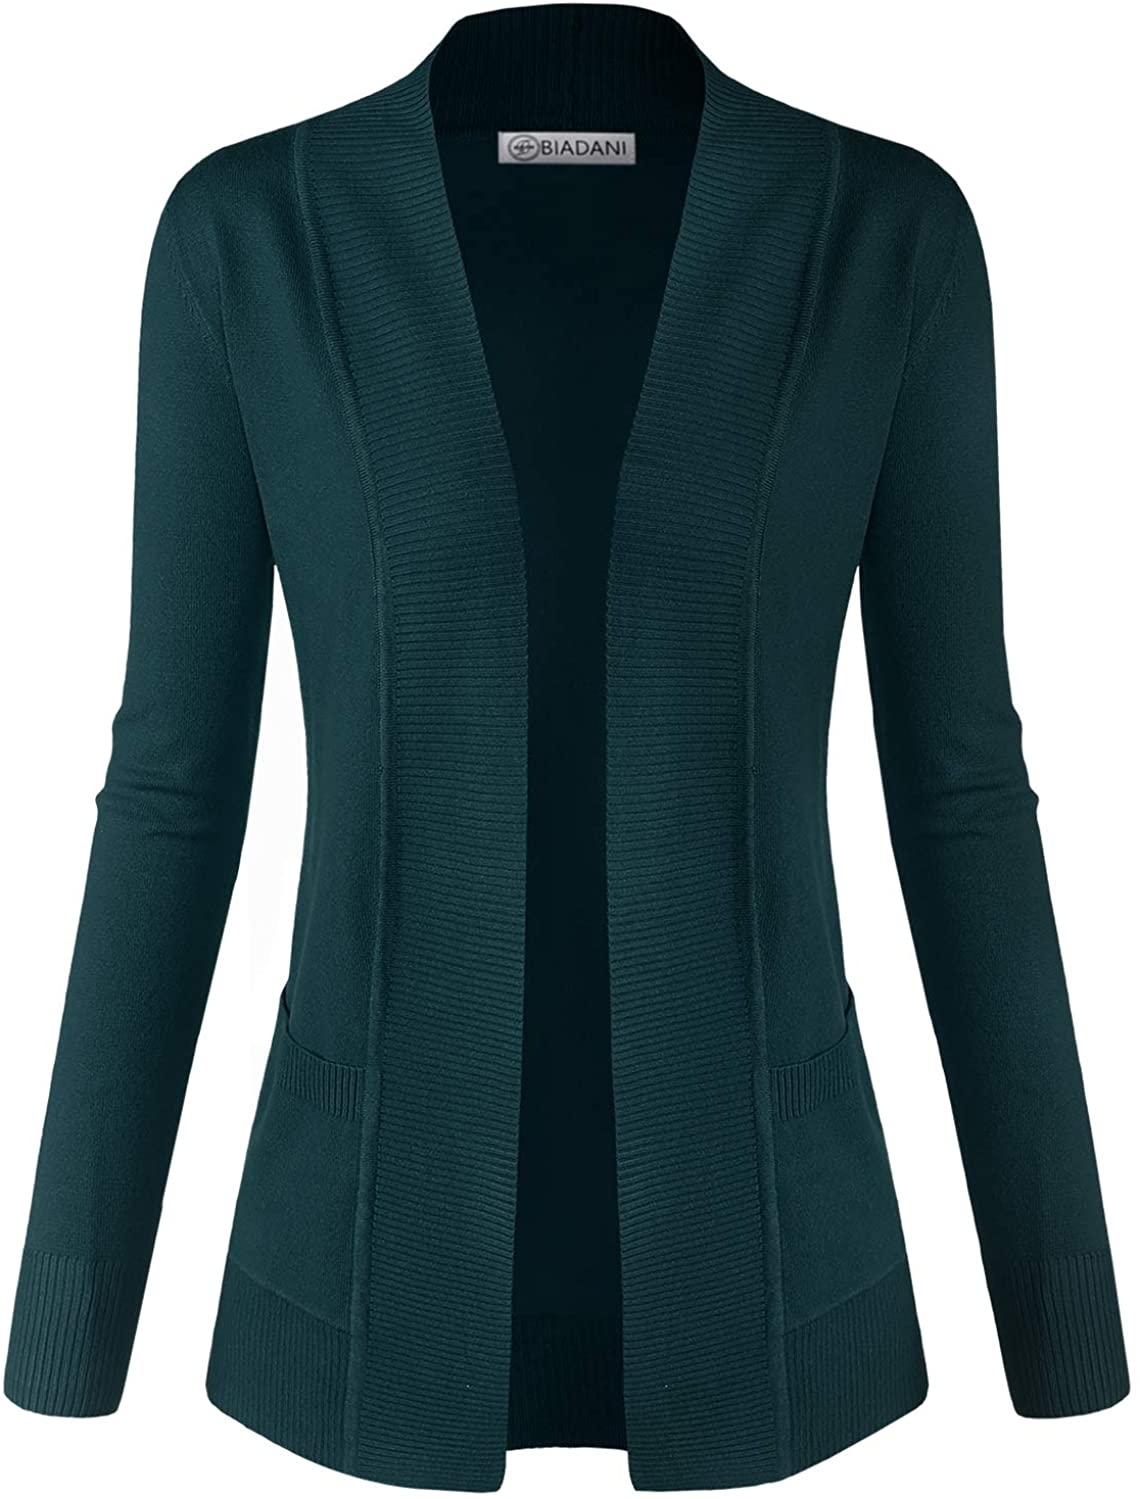 BIADANI Women Classic Soft Long Sleeve Open Front Cardigan Sweater Teal X-Large